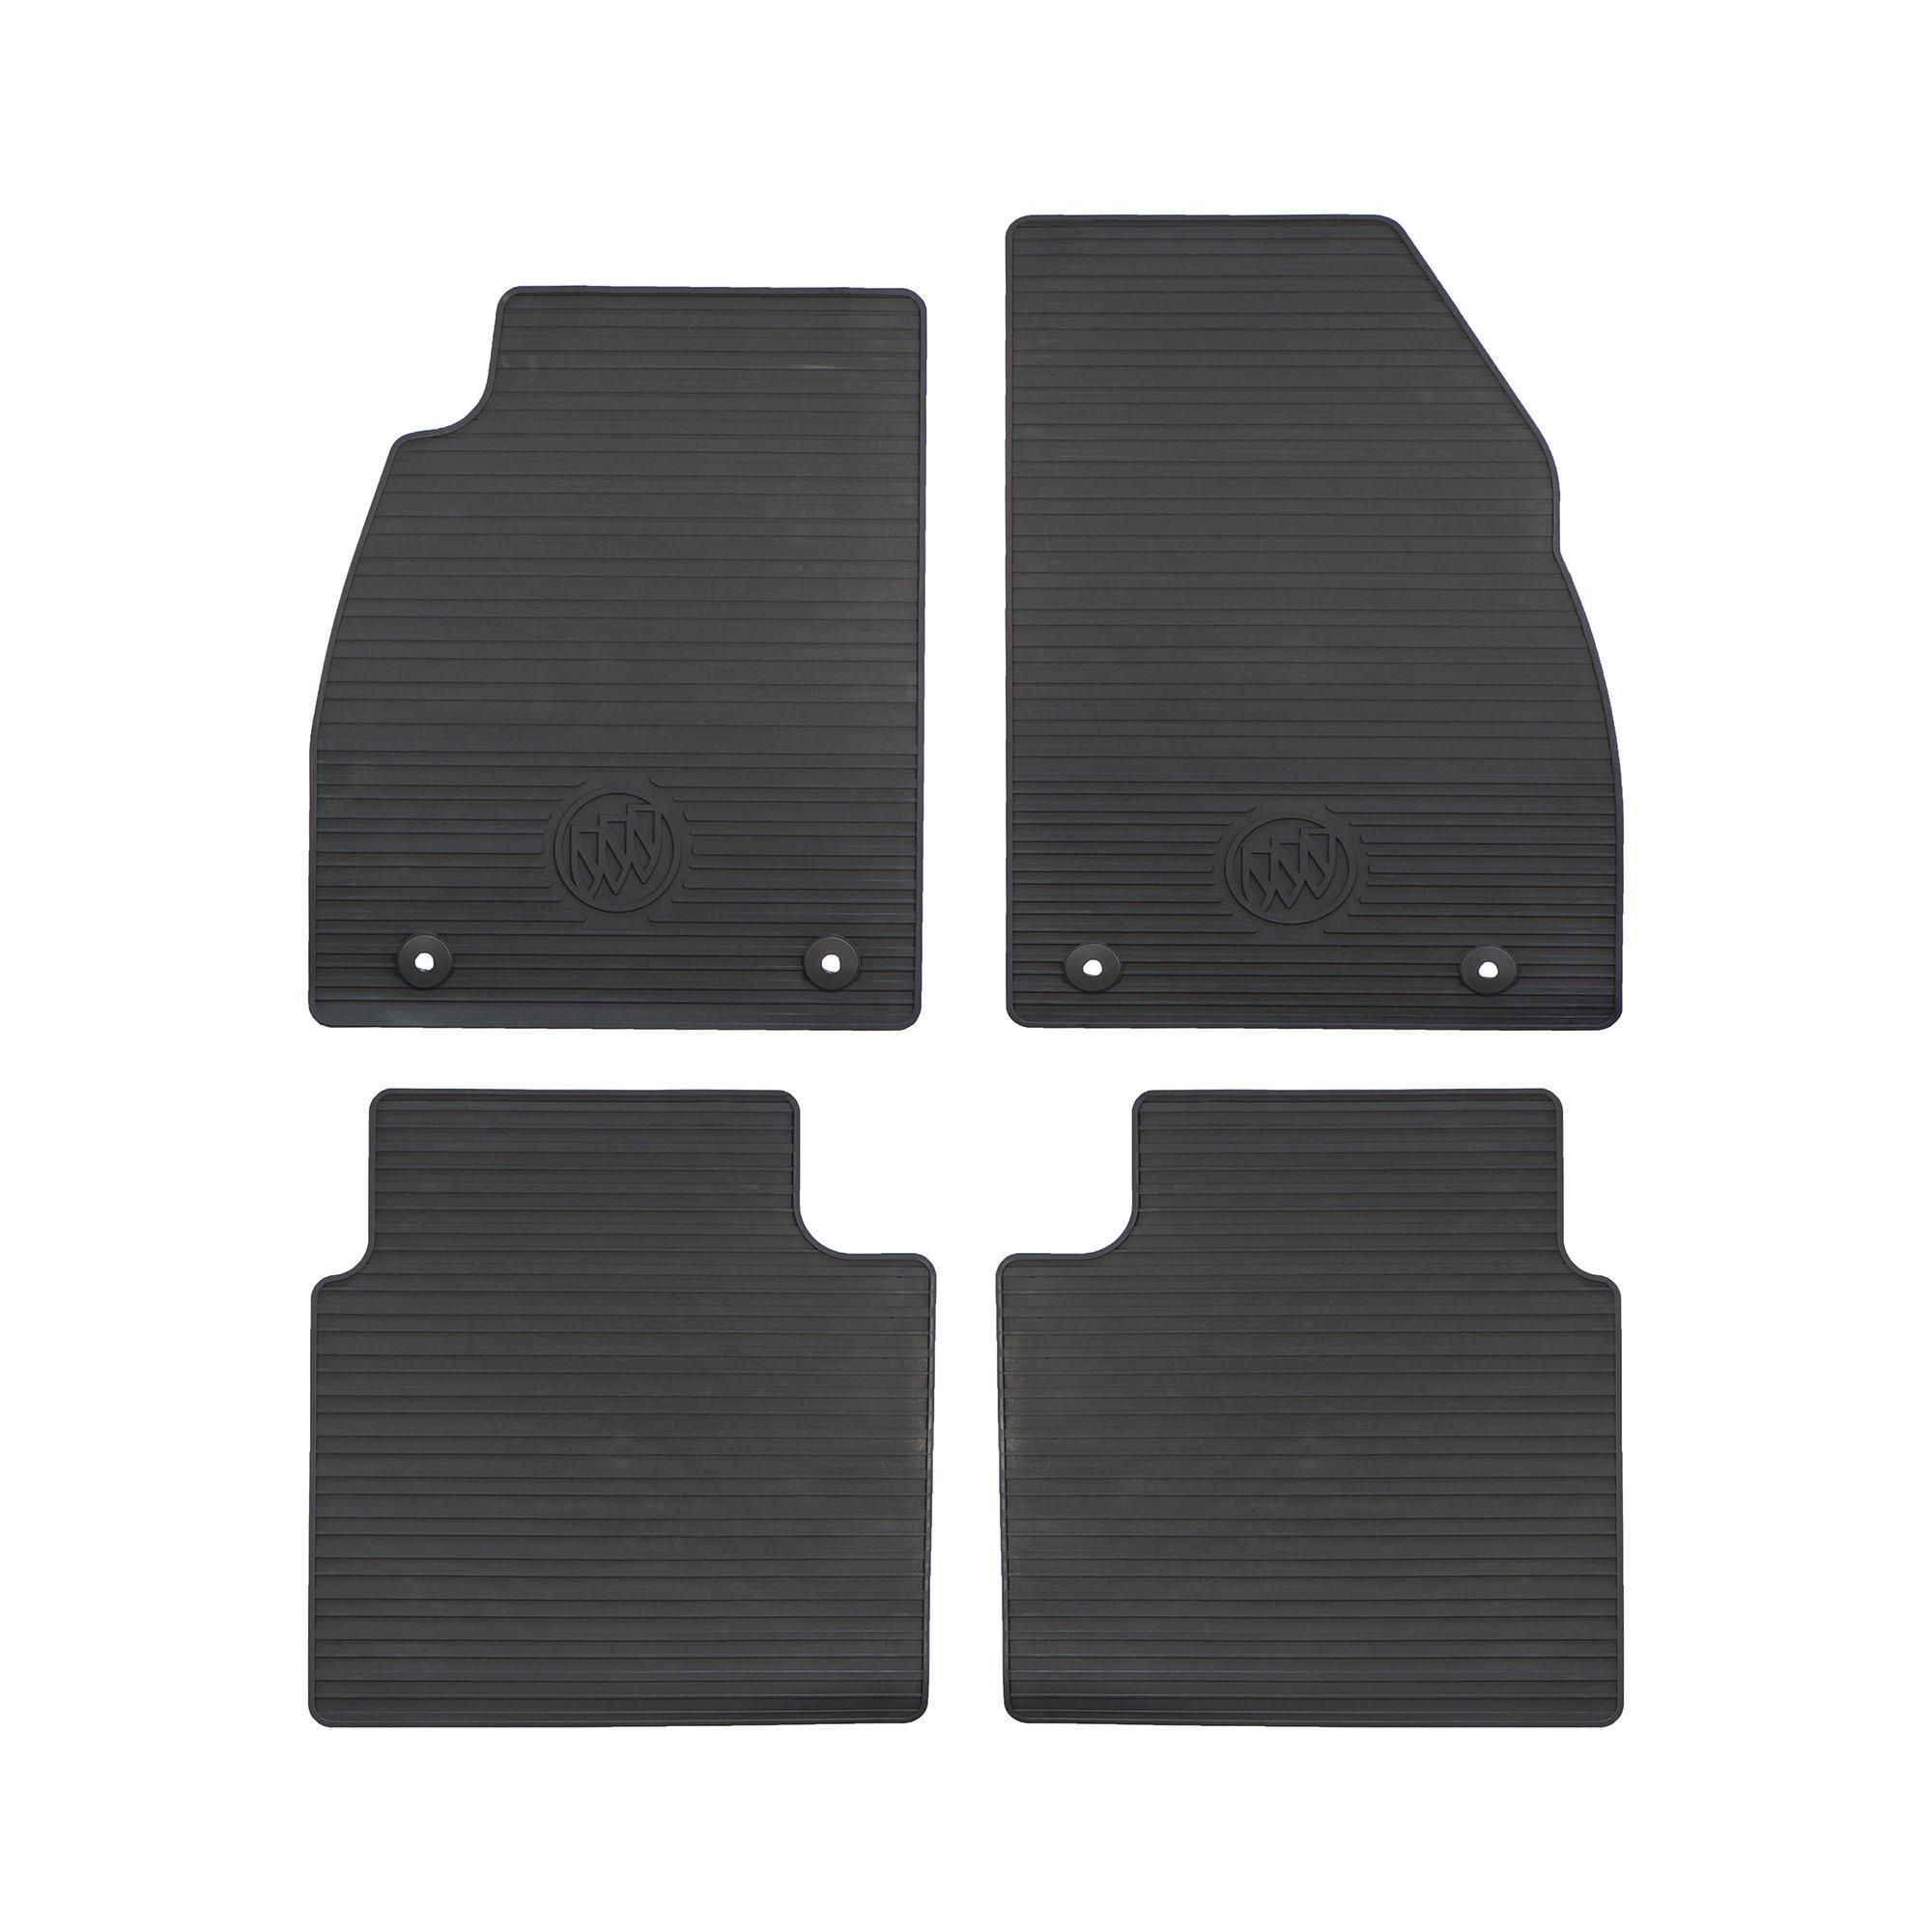 GMC OEM New Front & Rear All Weather Rubber Floor Mats Black 13-16 Lacrosse 23101701